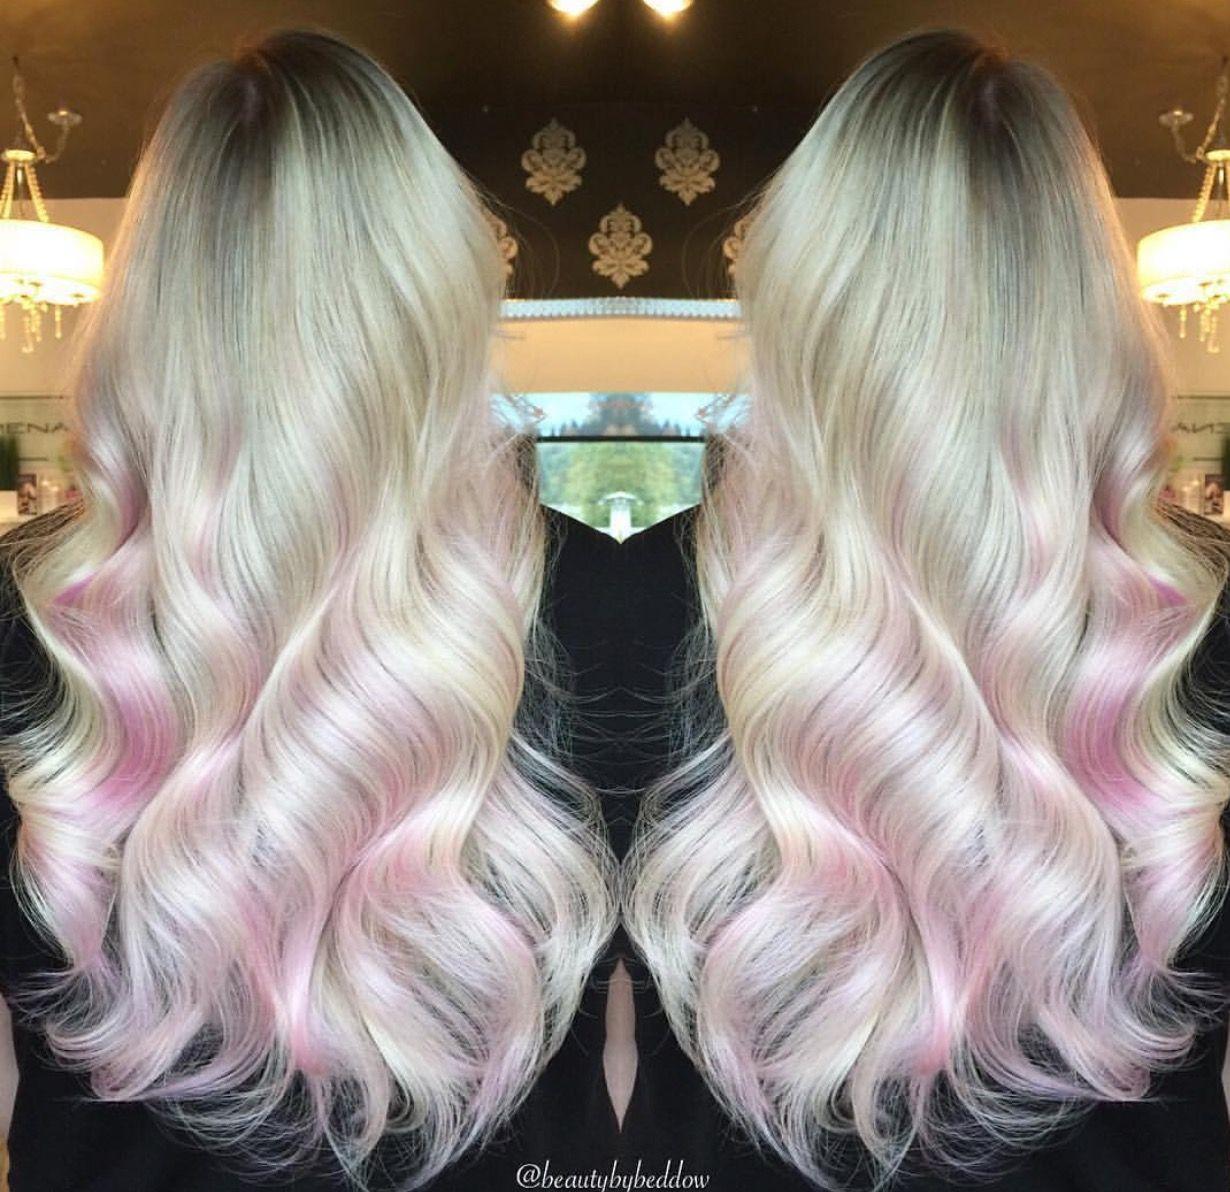 Long Platinum Blonde Locks With Pale Pink Underneath Pink Blonde Hair Dyed Blonde Hair Pink Underneath Hair